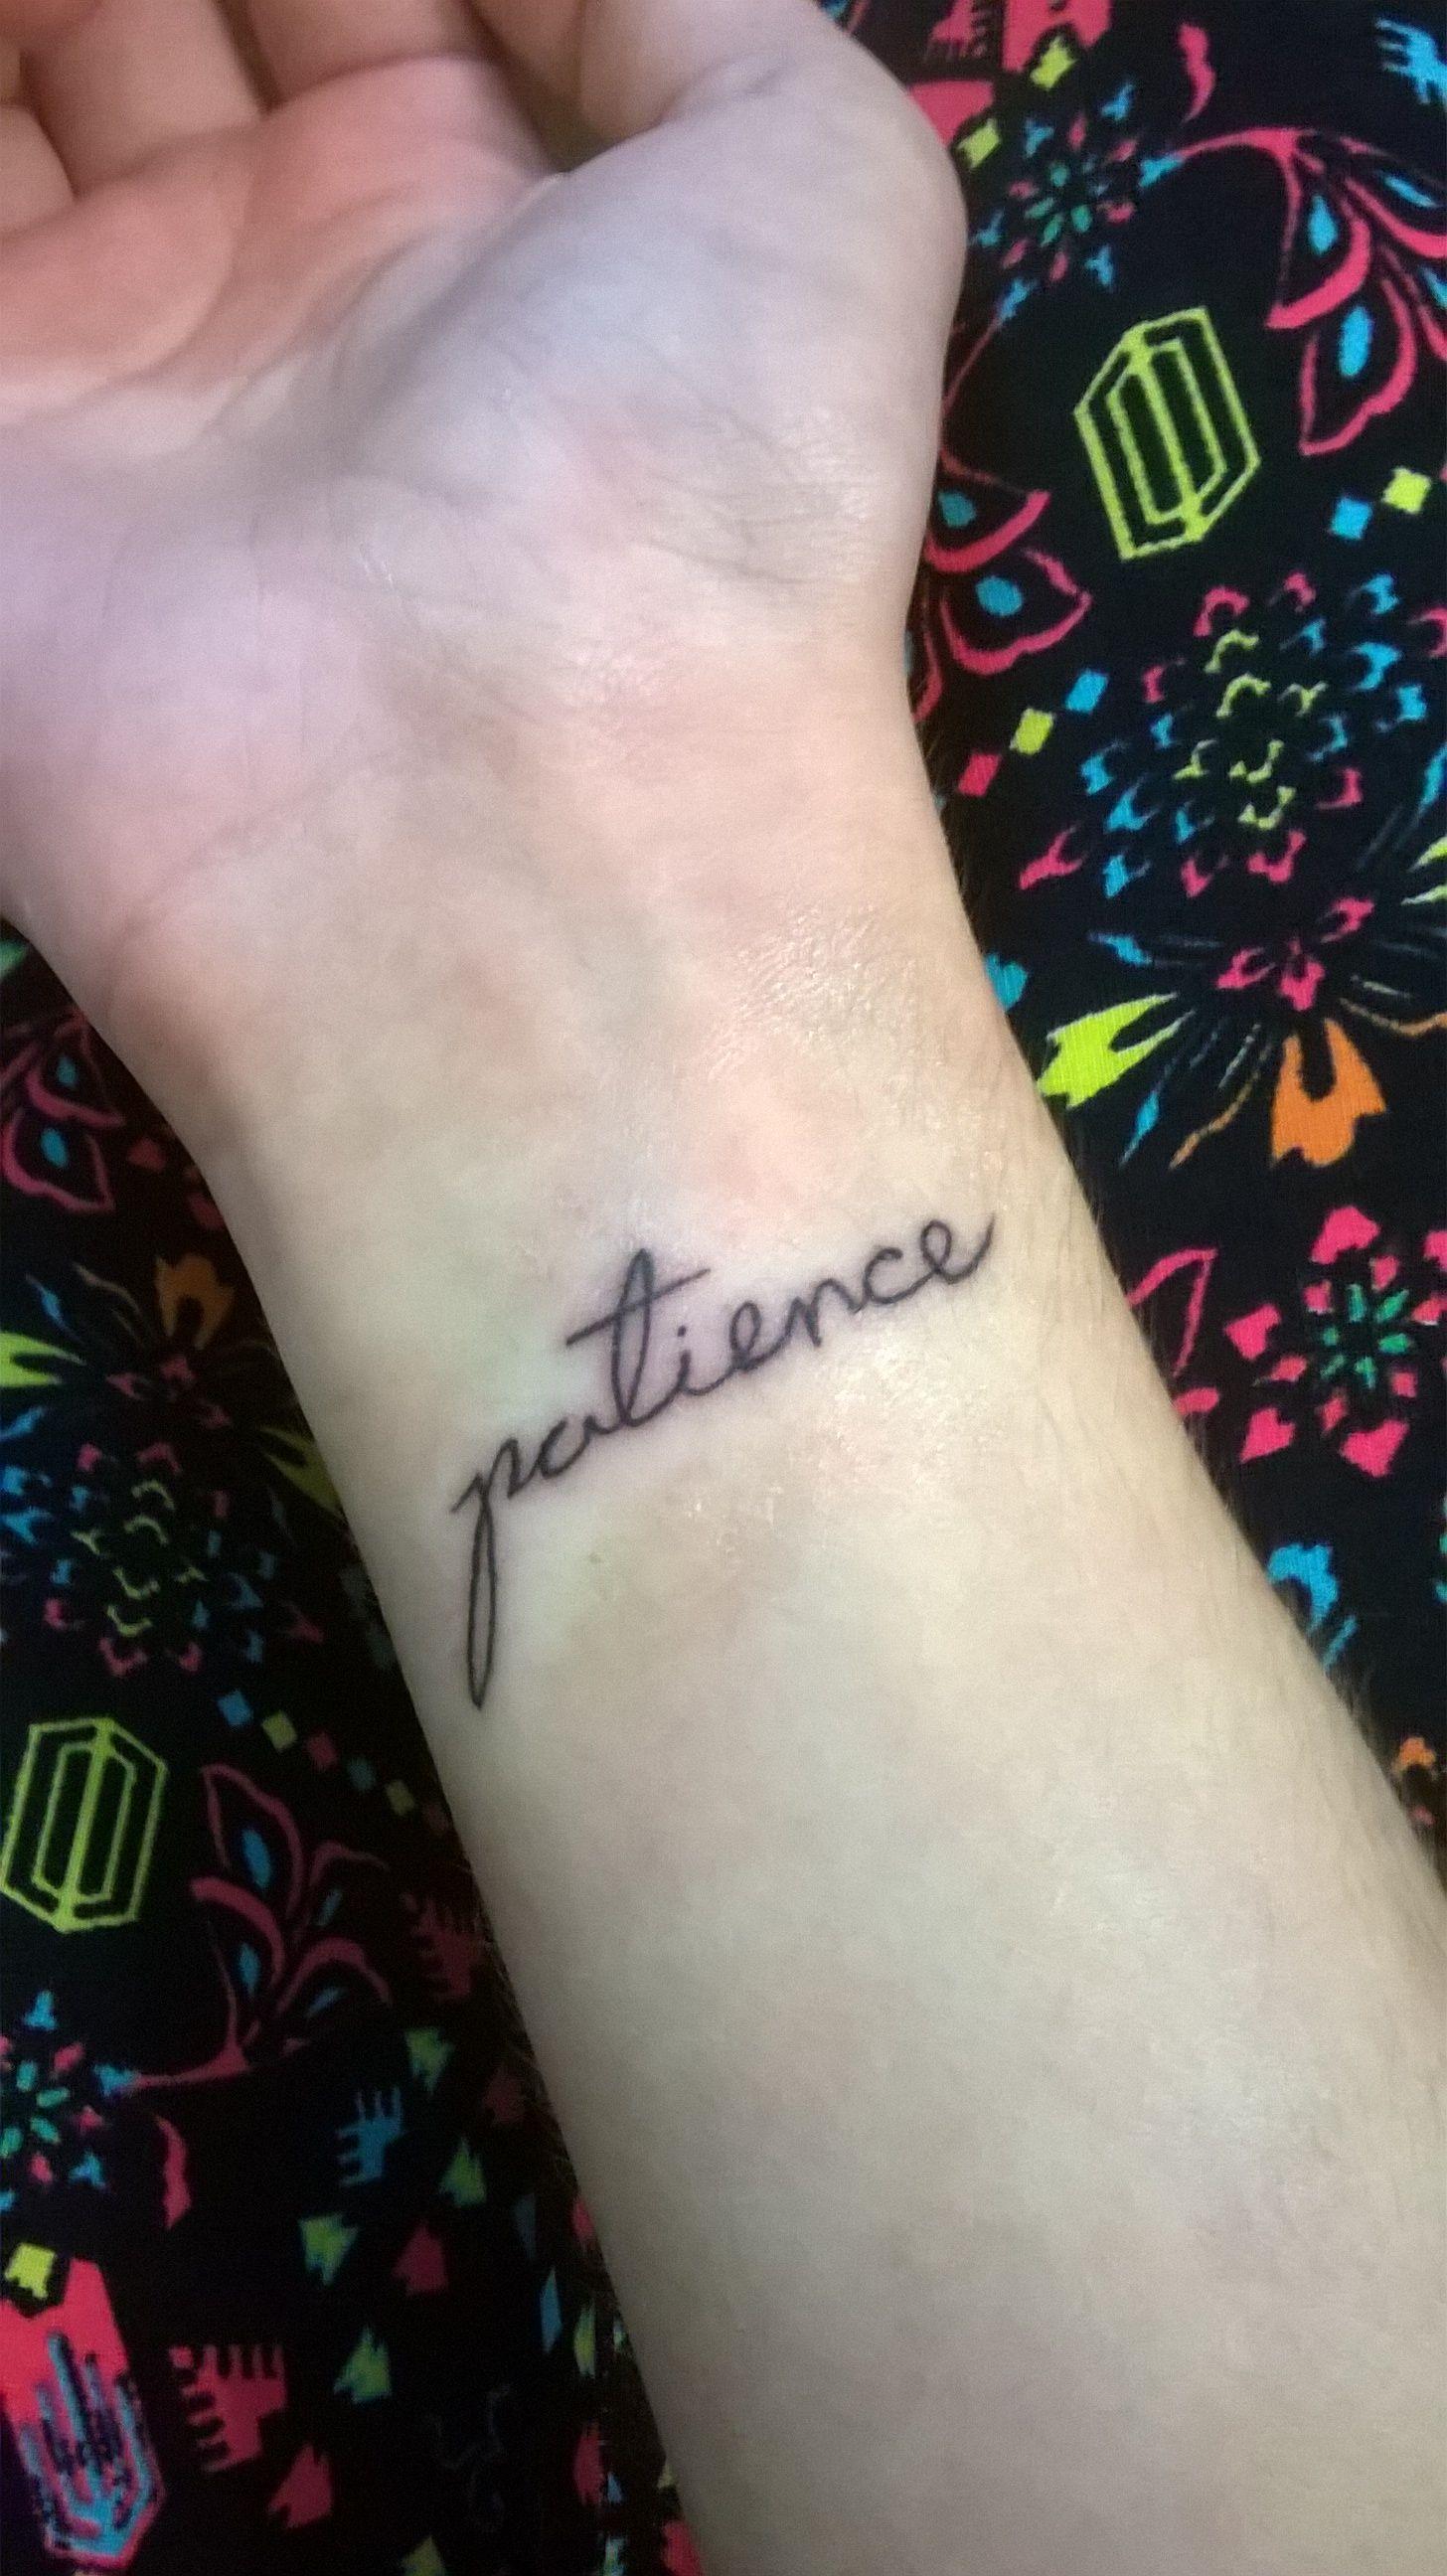 Patience tattoo guns n 39 roses tattoo pinterest for Guns n roses tattoos